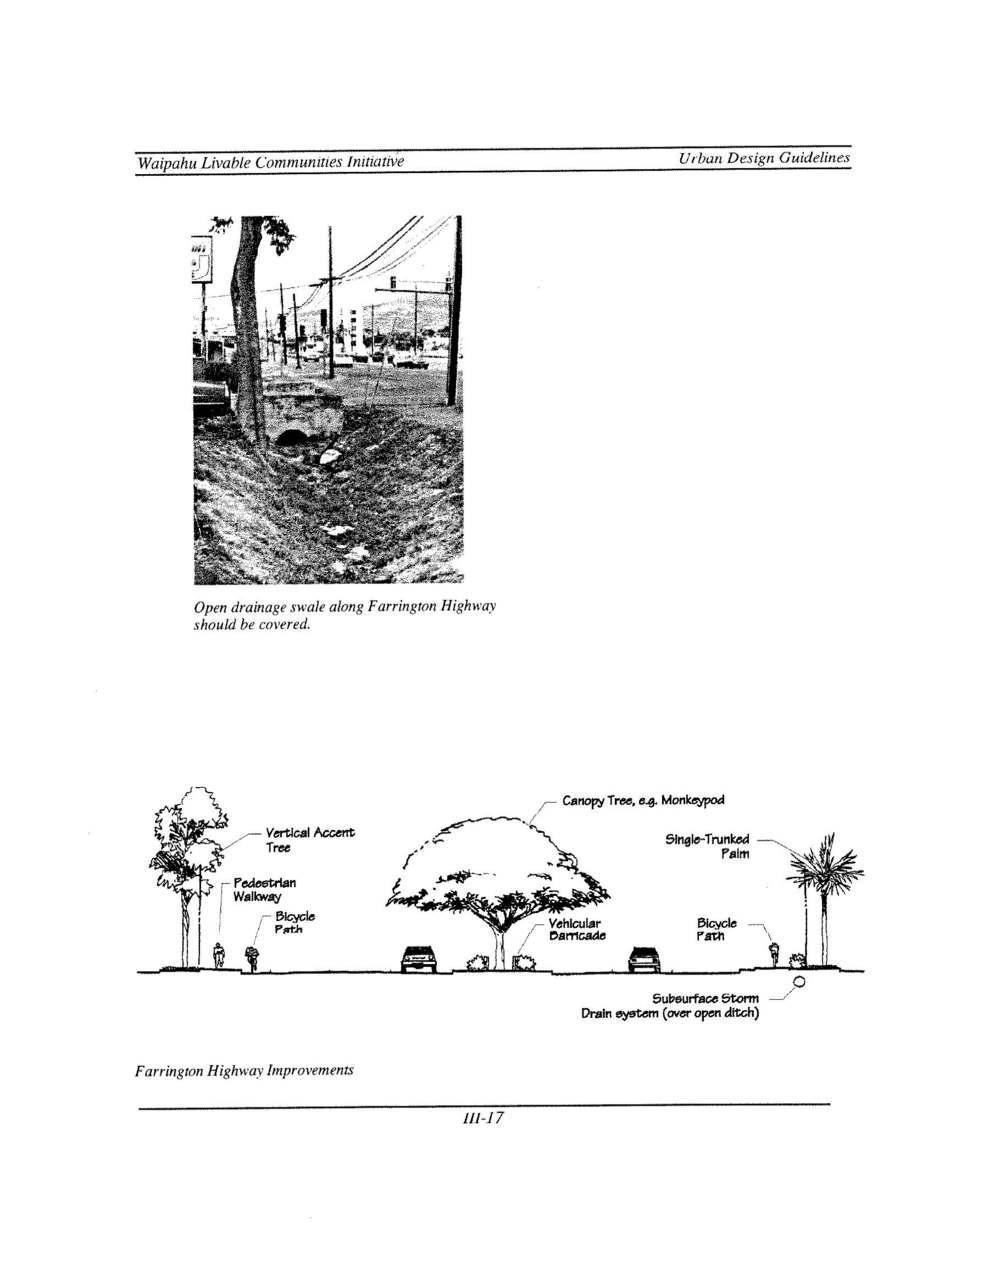 160531_WaipahuLivableCommunities(1998)_Page_107.jpg